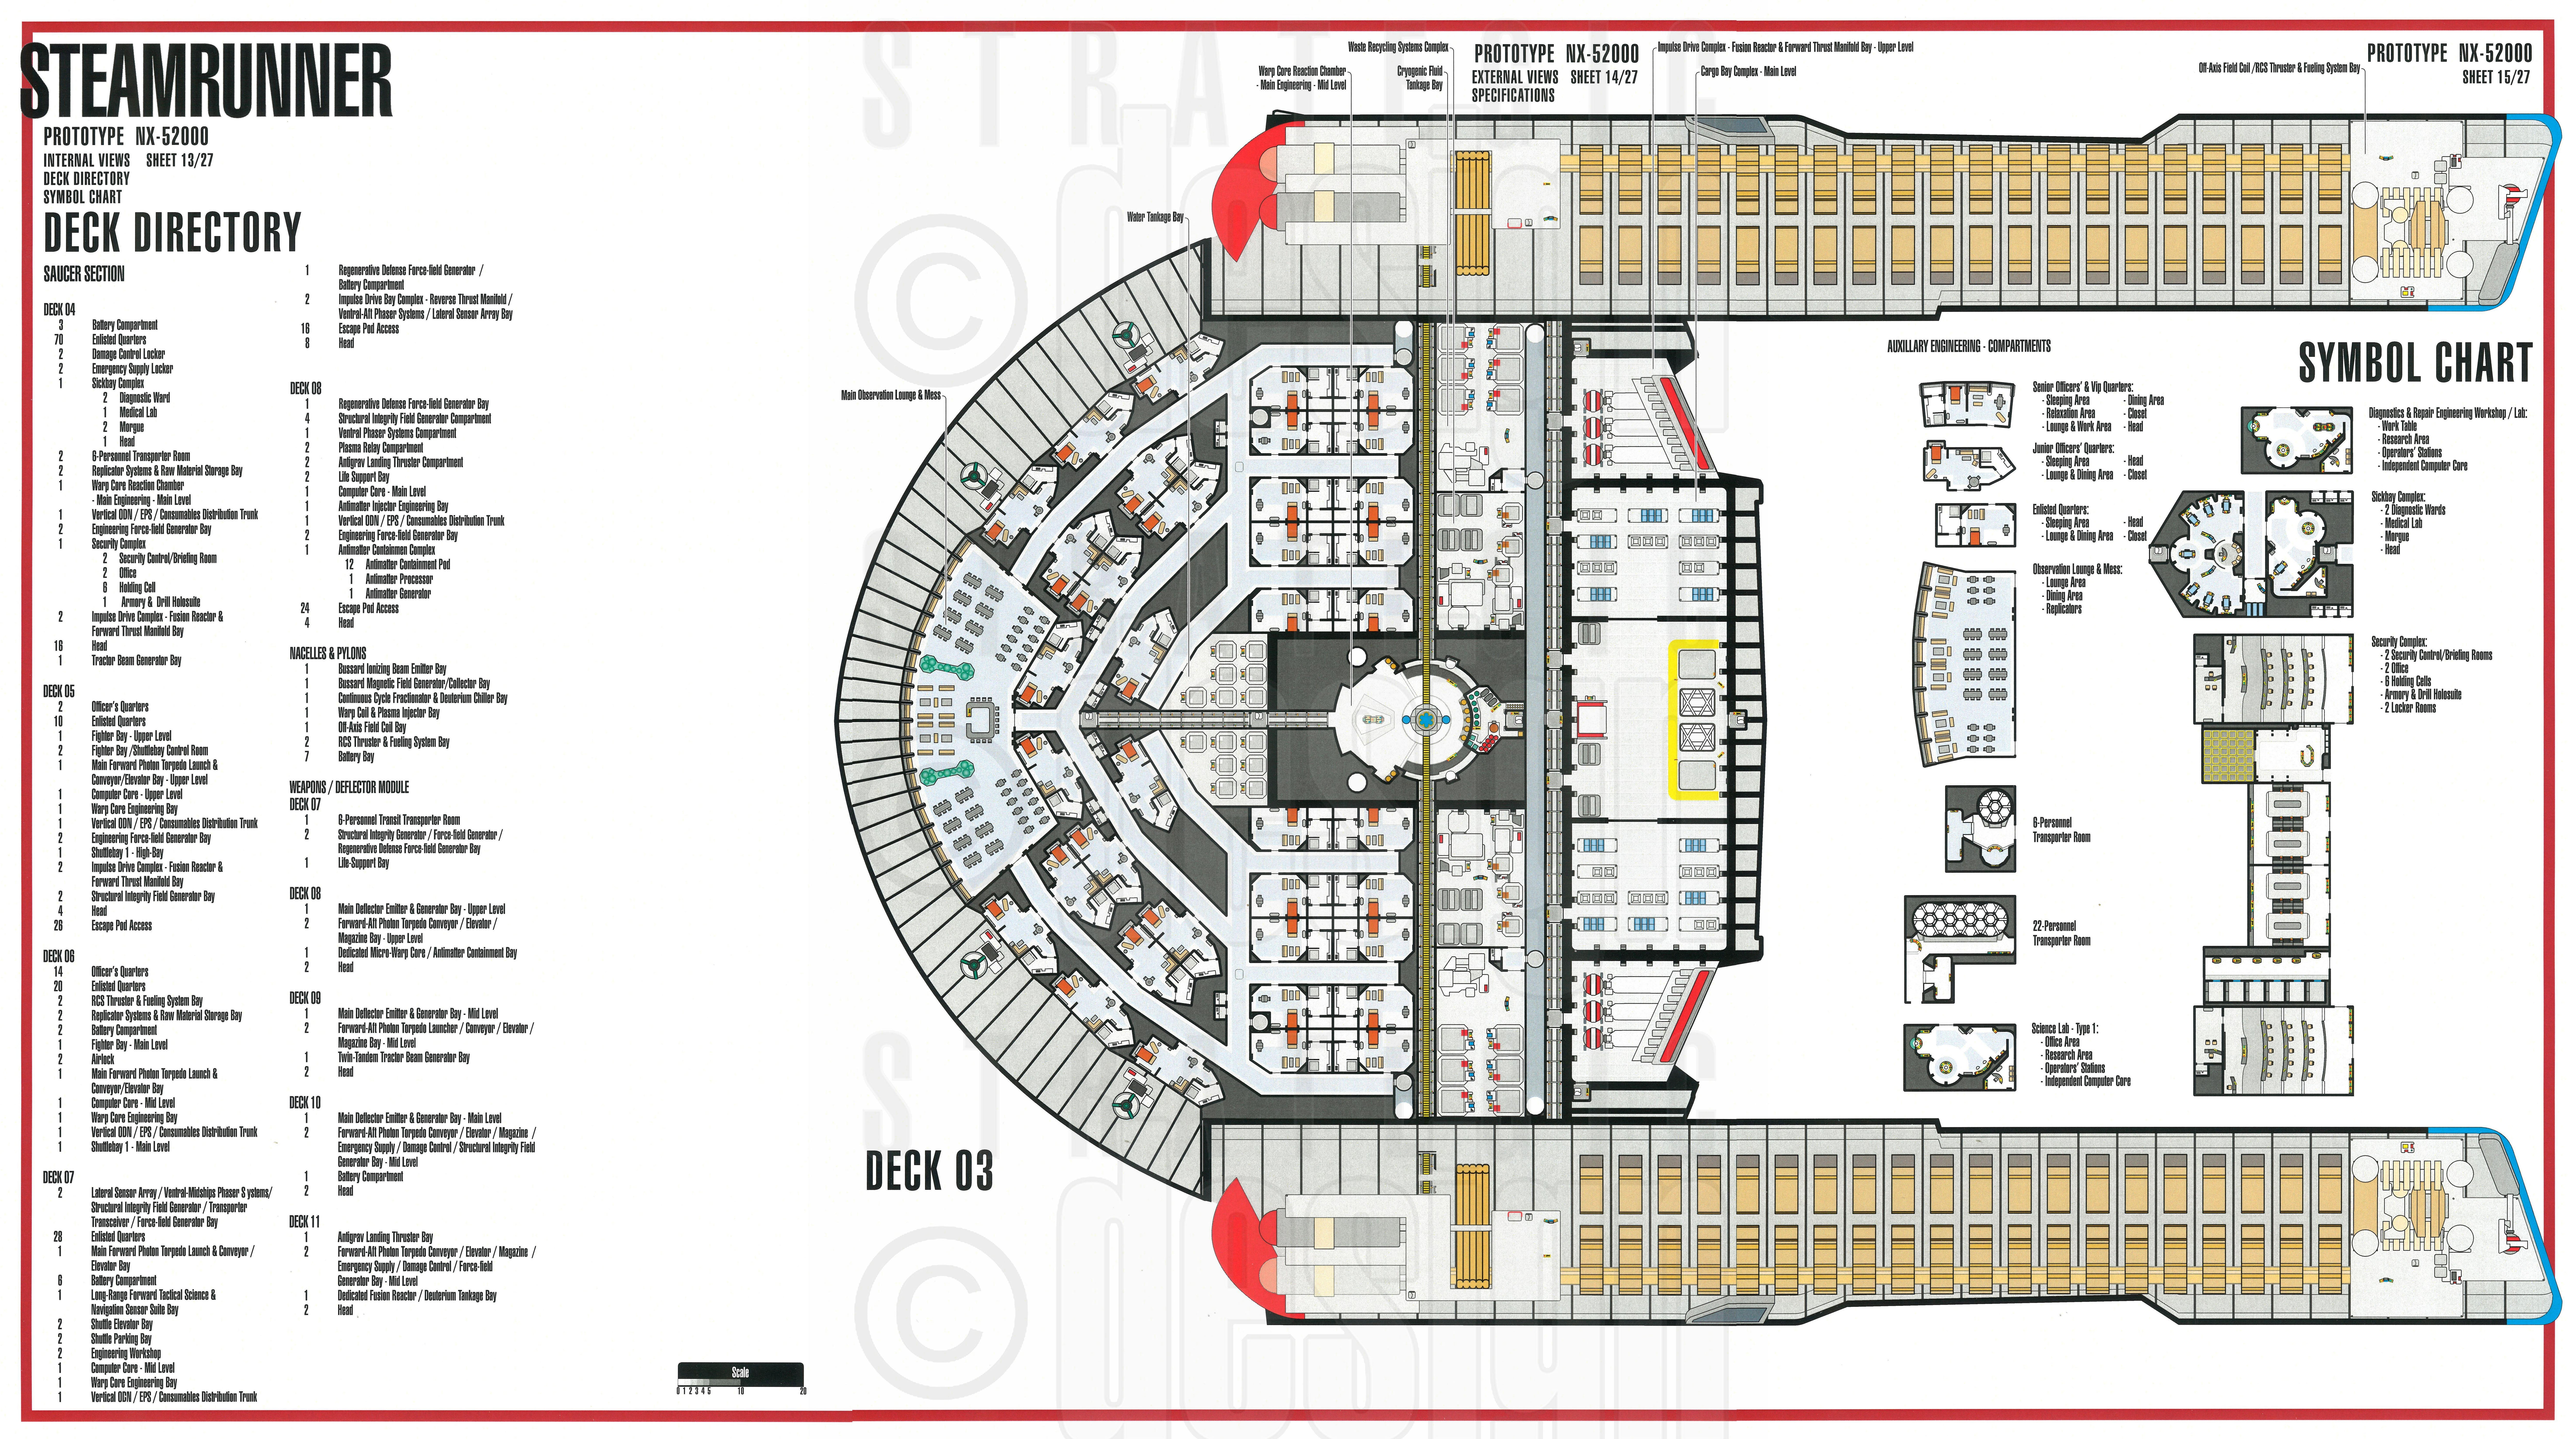 Star trek blueprints steamrunner class starship prototype nx 52000 sheets 13 15 deck 03 symbol chart deck directory malvernweather Images